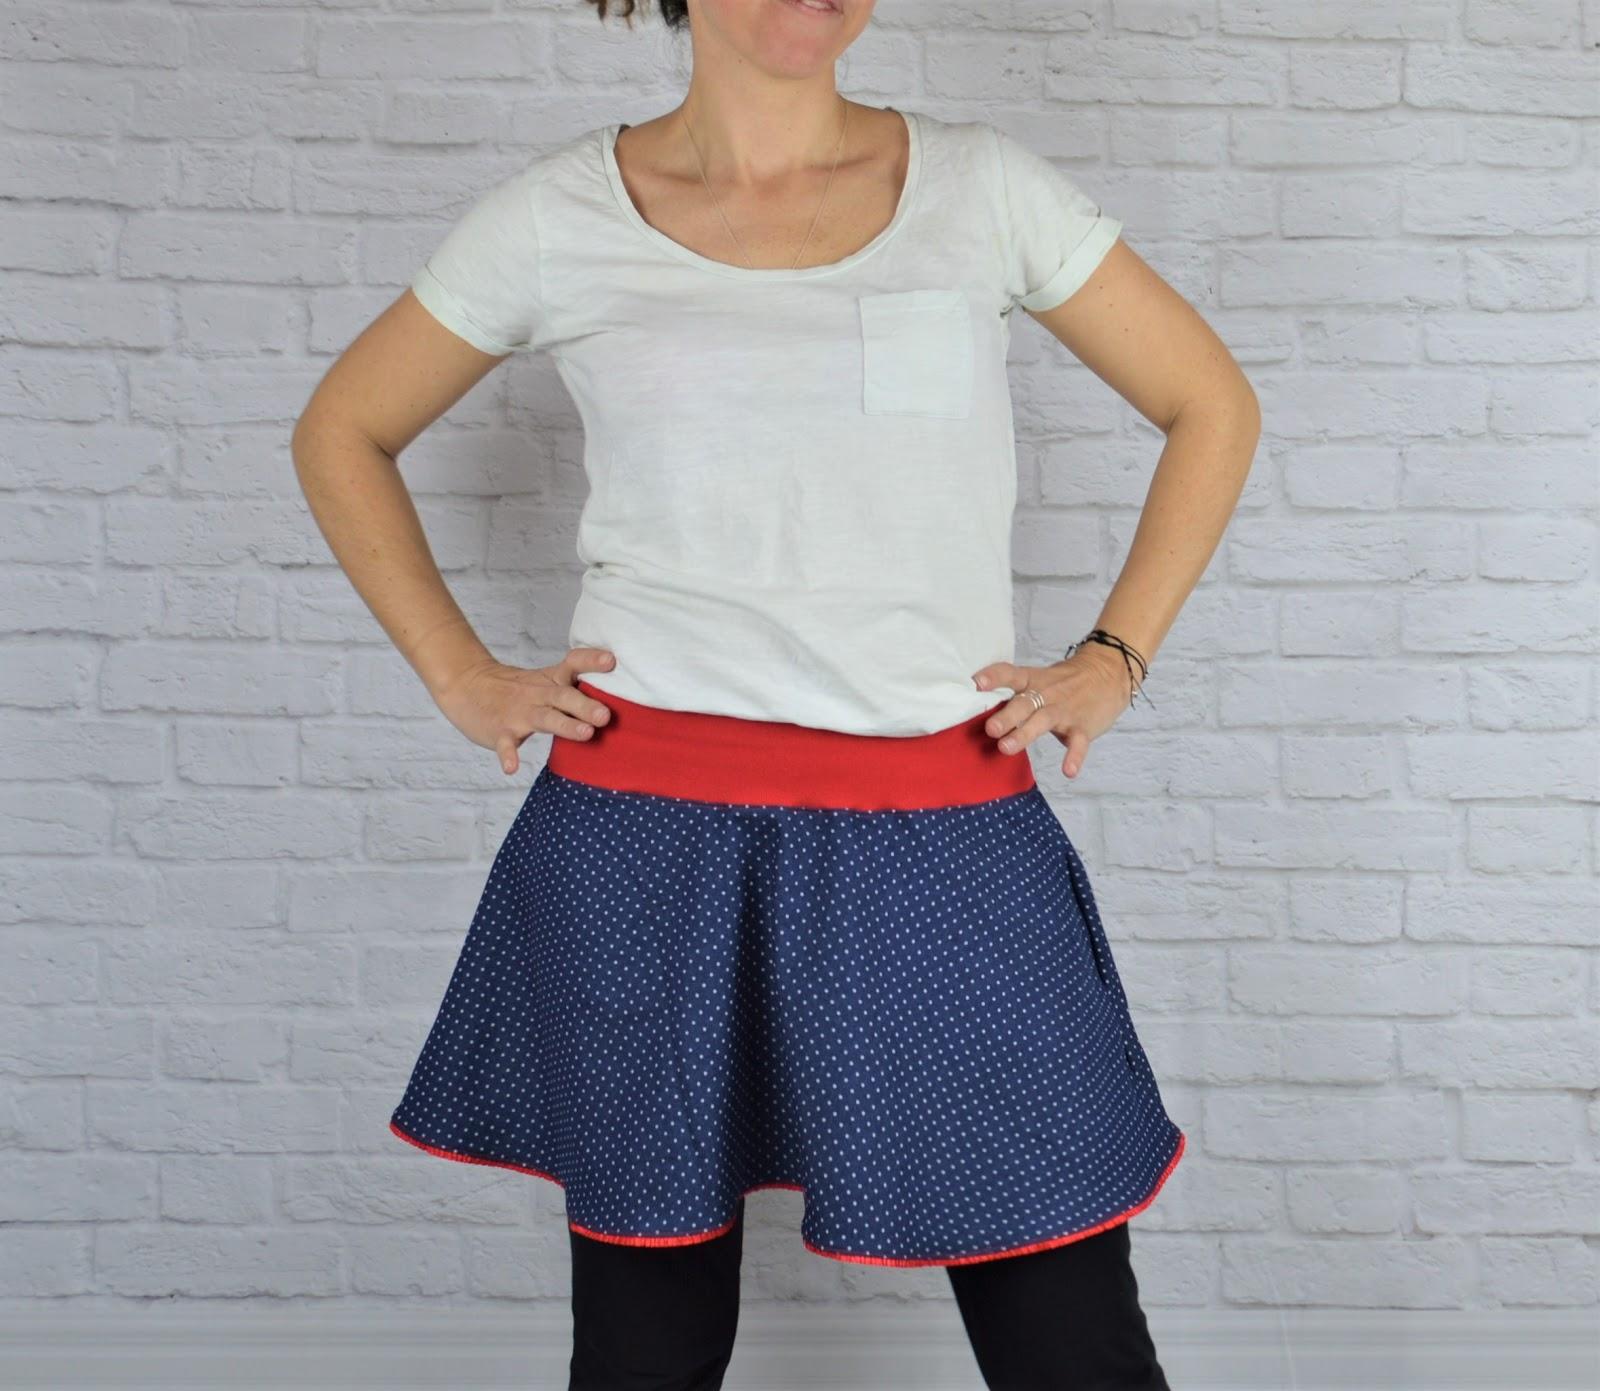 falda de vuelo mujer hecha a mano por uve original